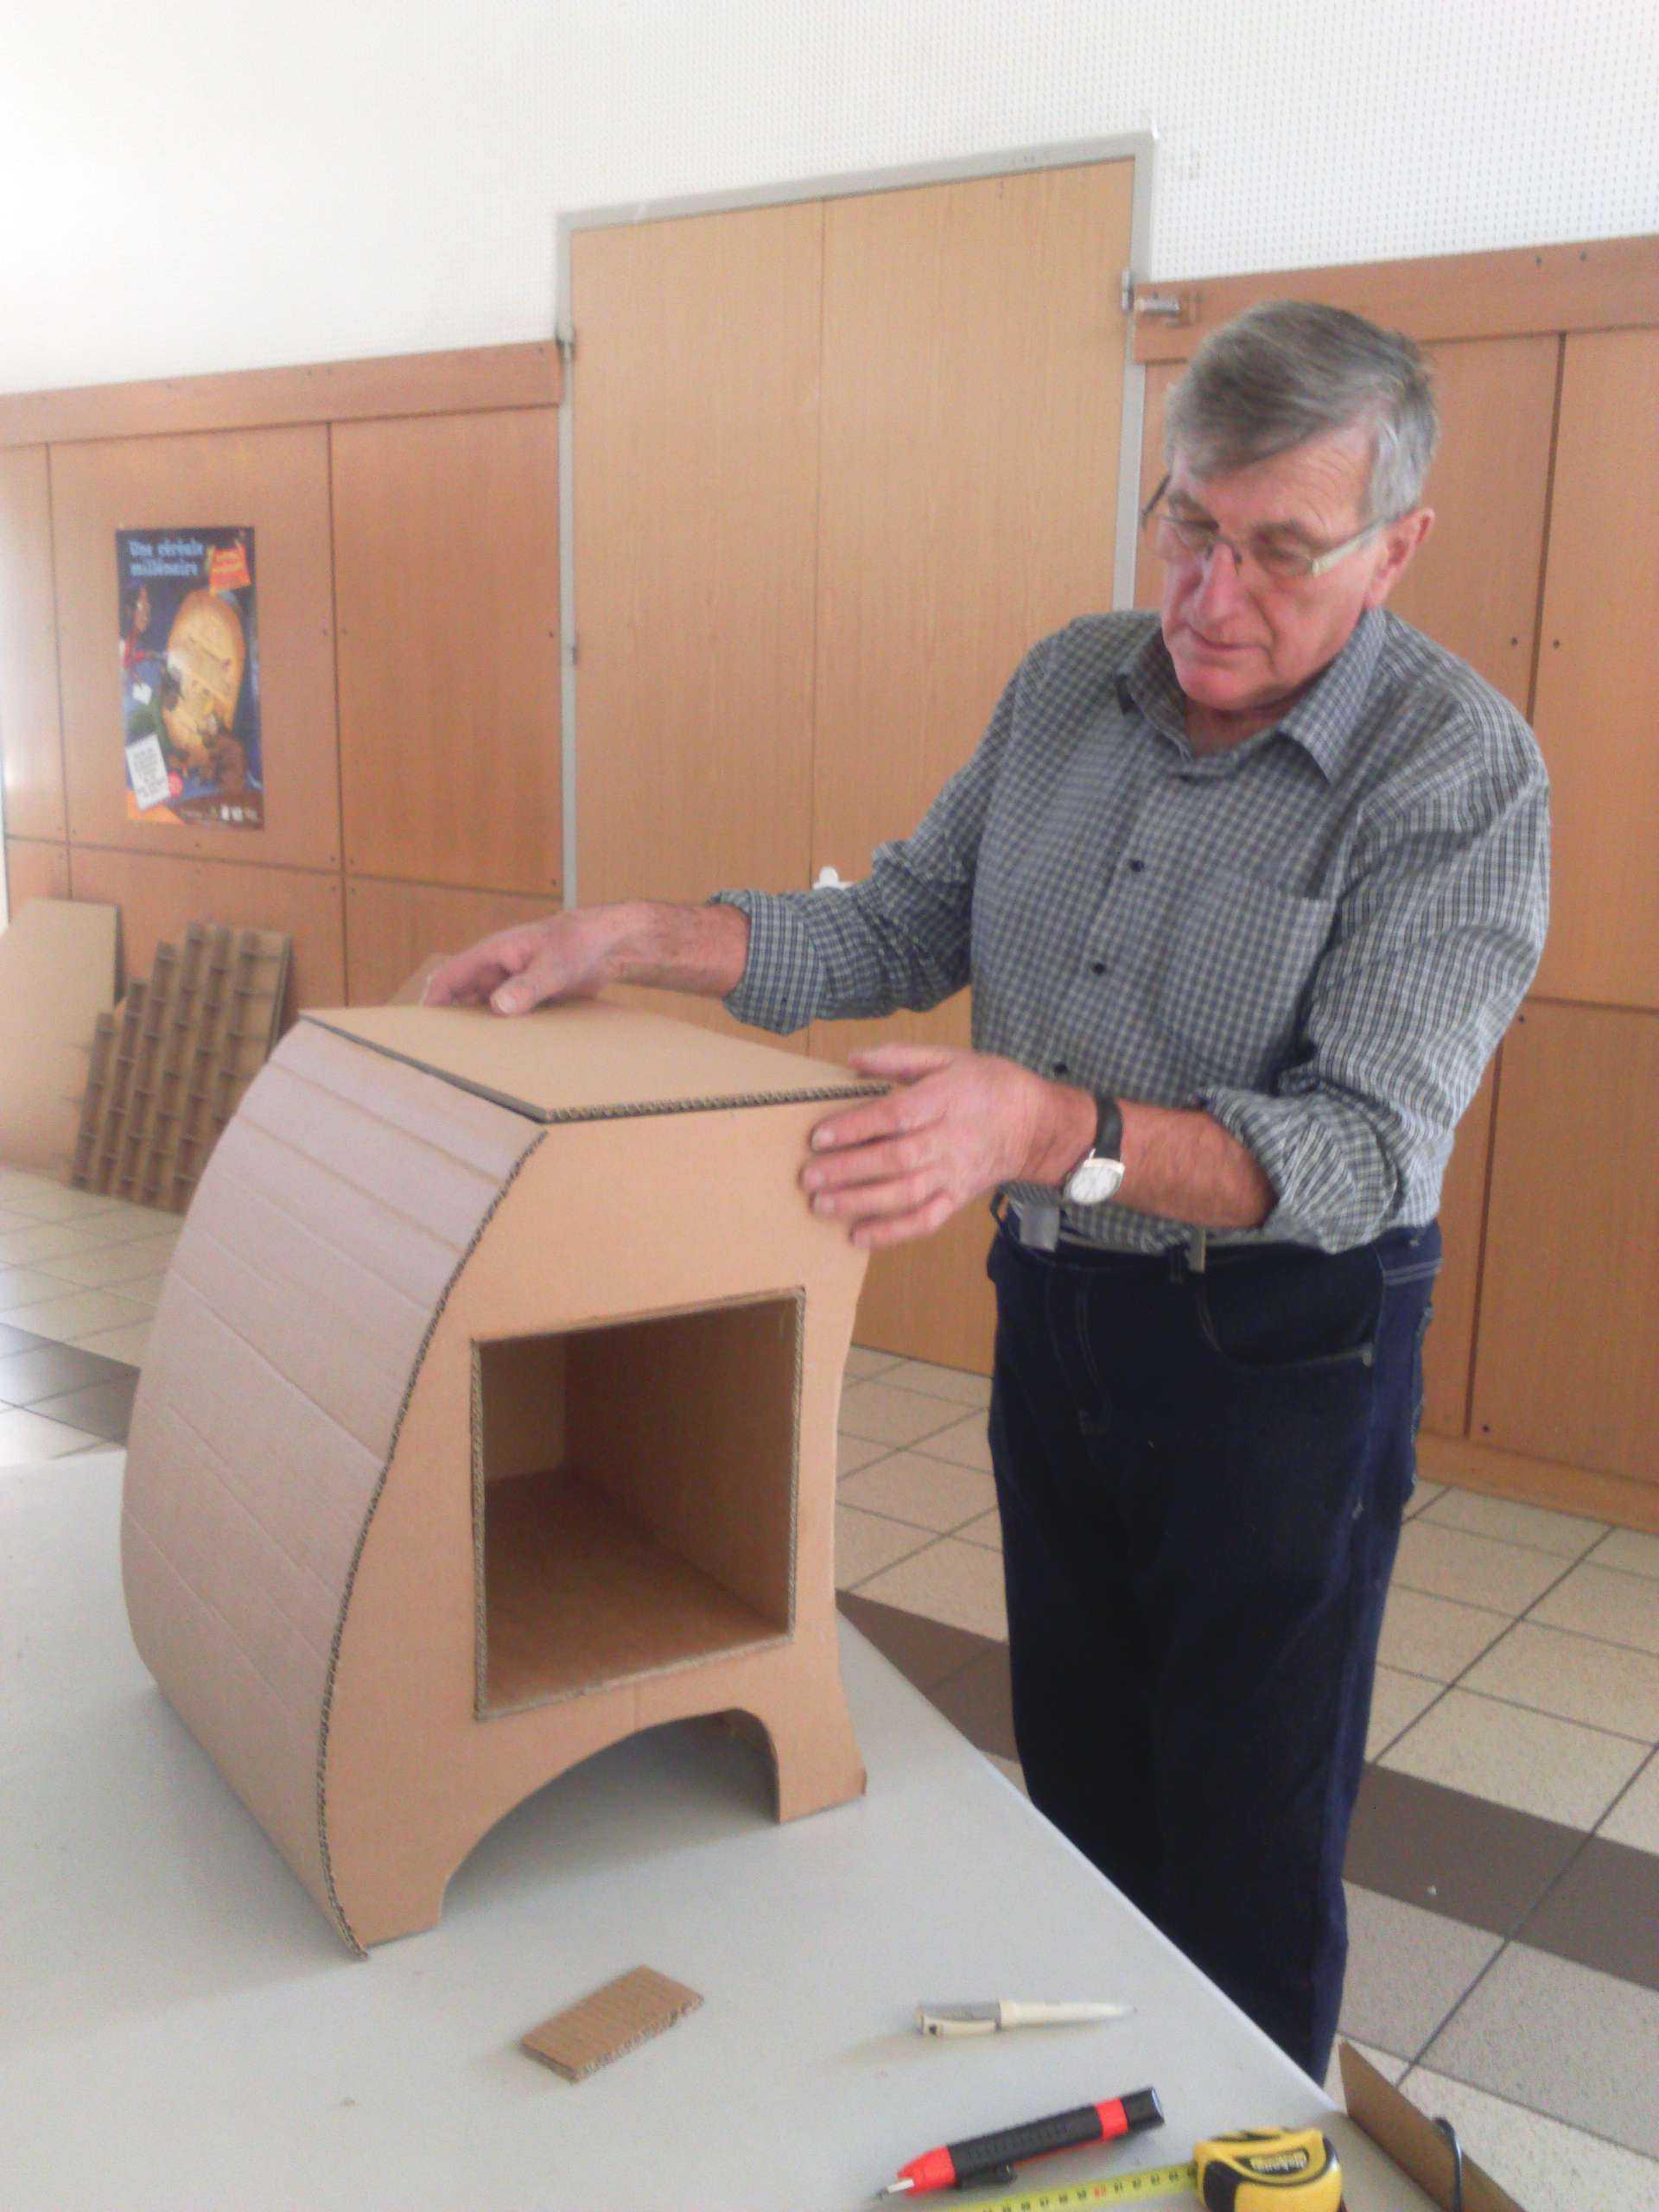 avec du carton de recuperation centre social de mably 42. Black Bedroom Furniture Sets. Home Design Ideas